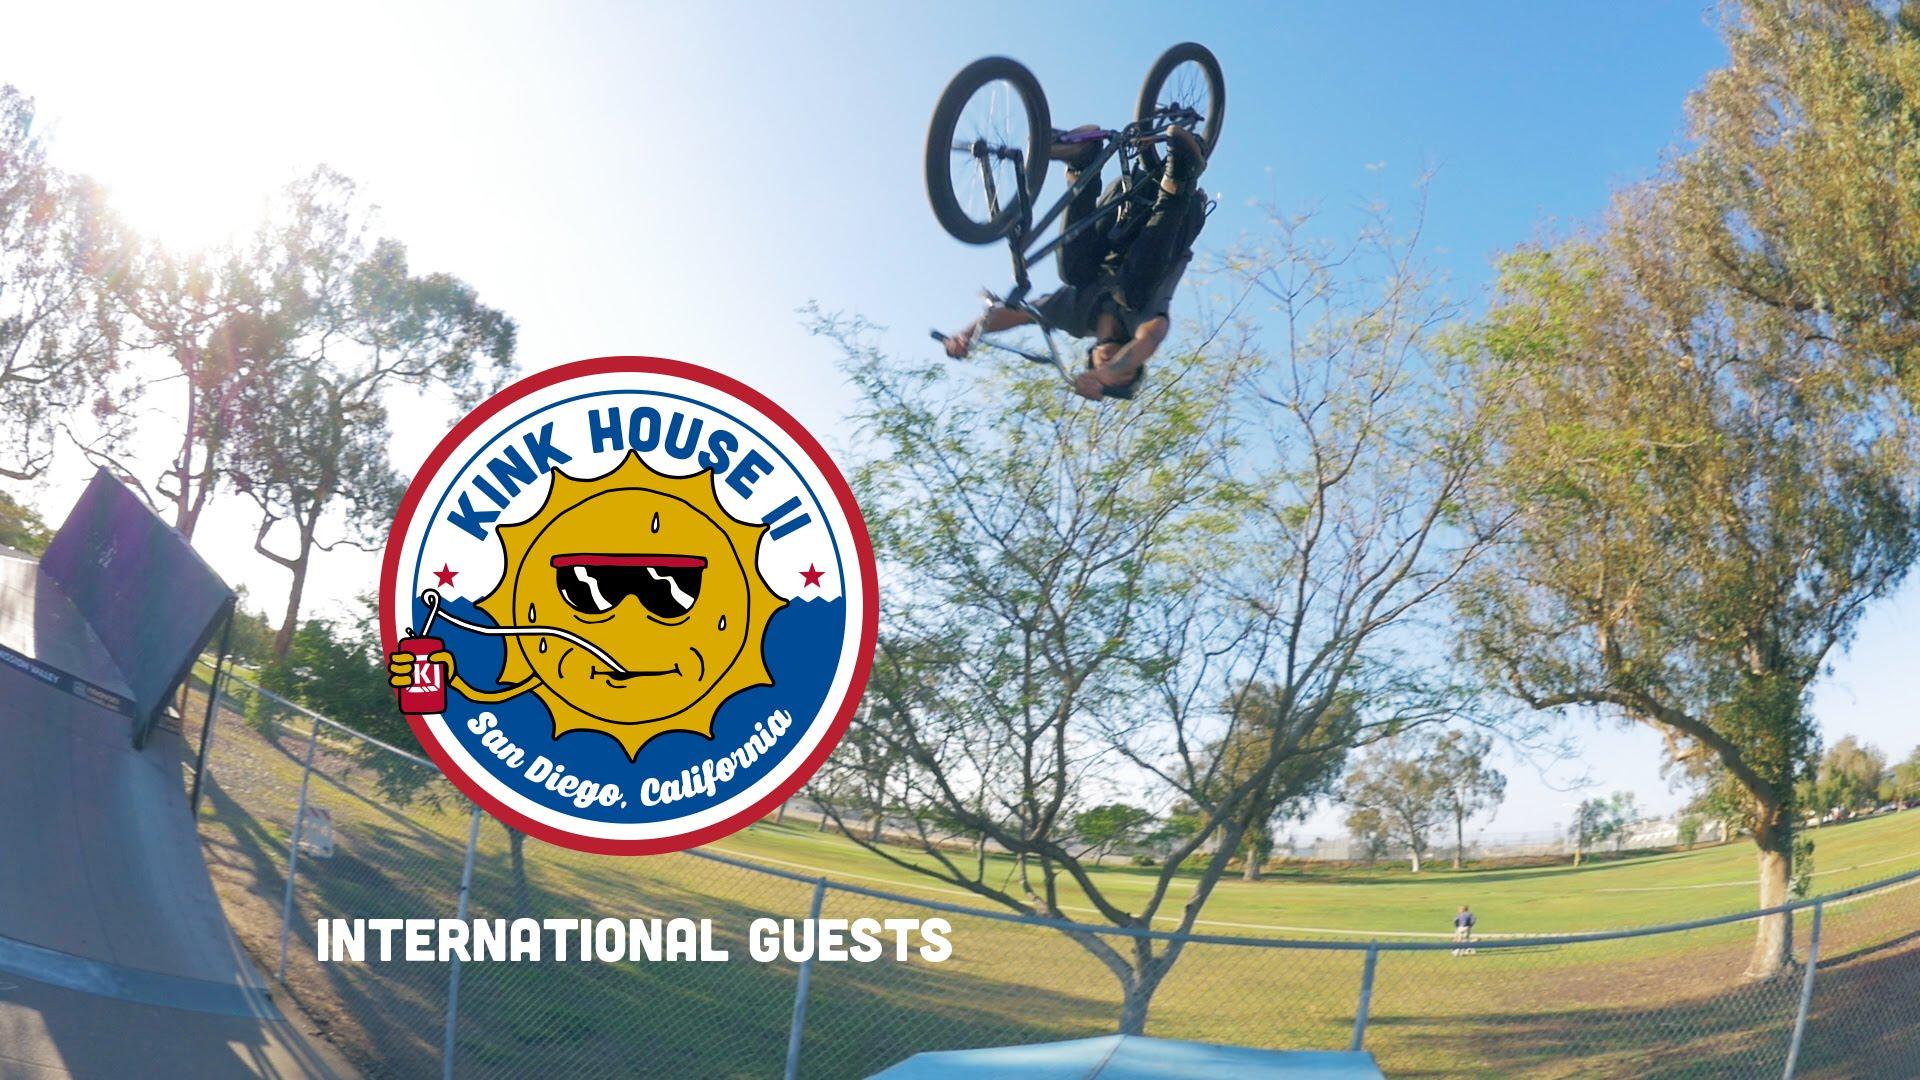 #KinkHouse – International Guests